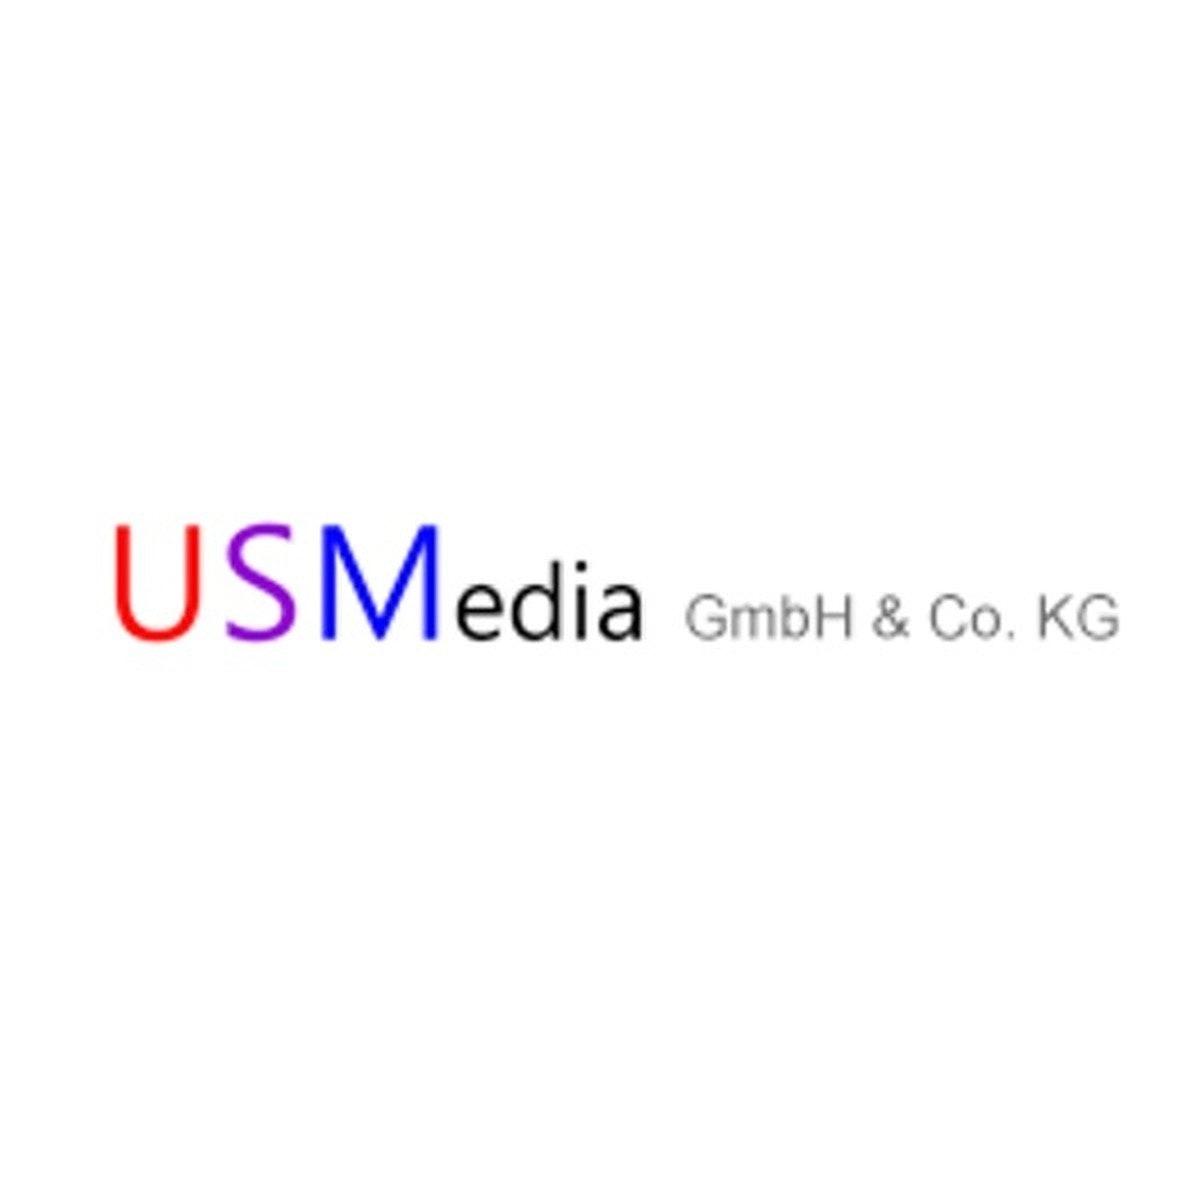 USMedia GmbH & Co. KG